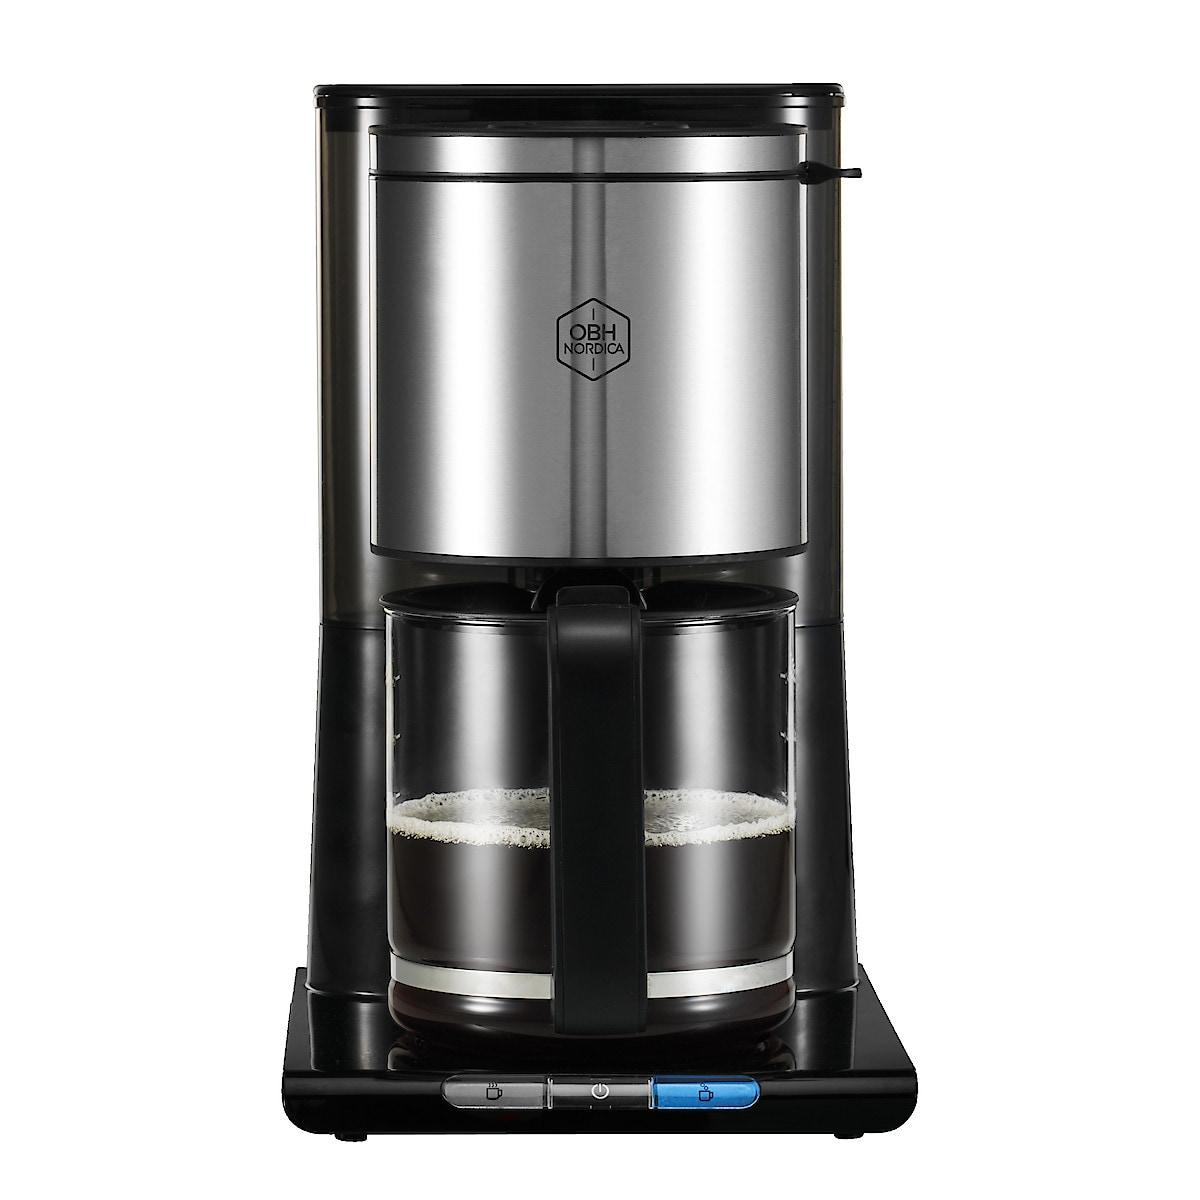 Kaffebryggare OBH Nordica Café Momento